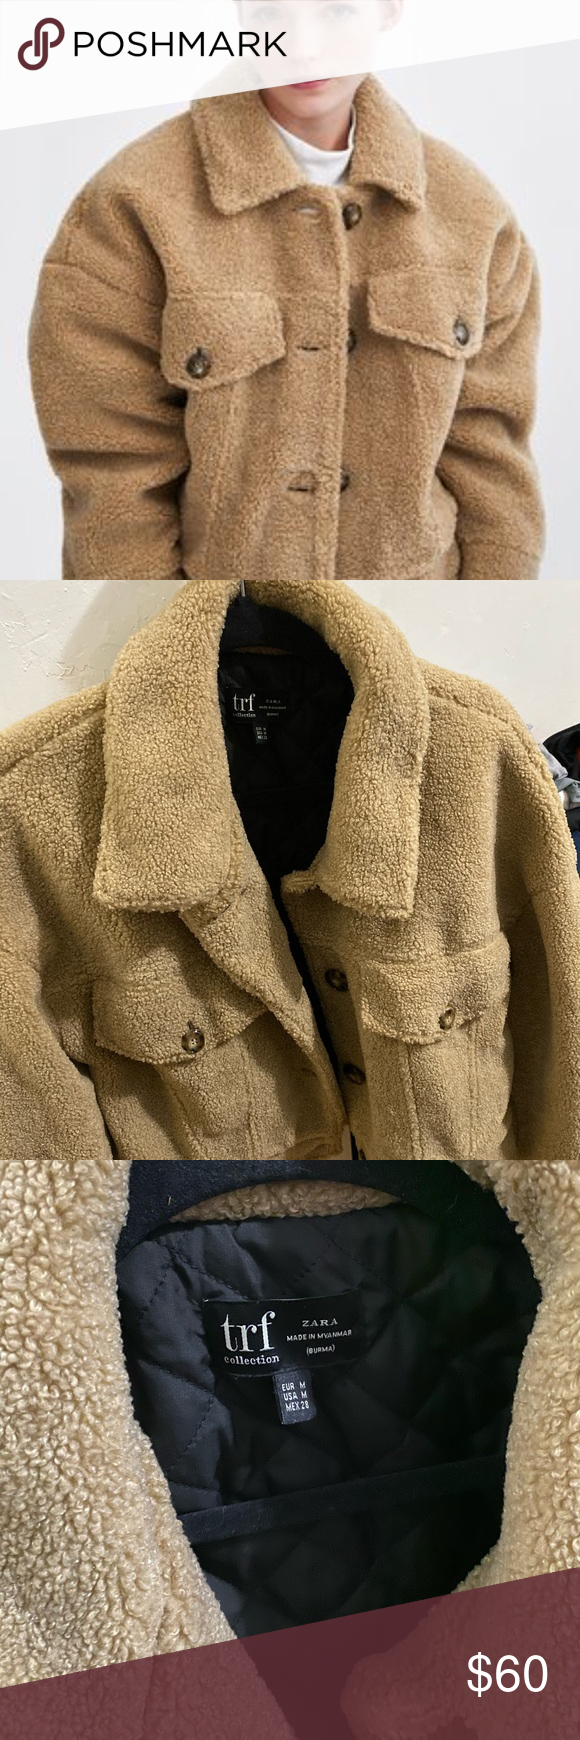 Zara short faux shearling jacket Loosefitting long sleeve